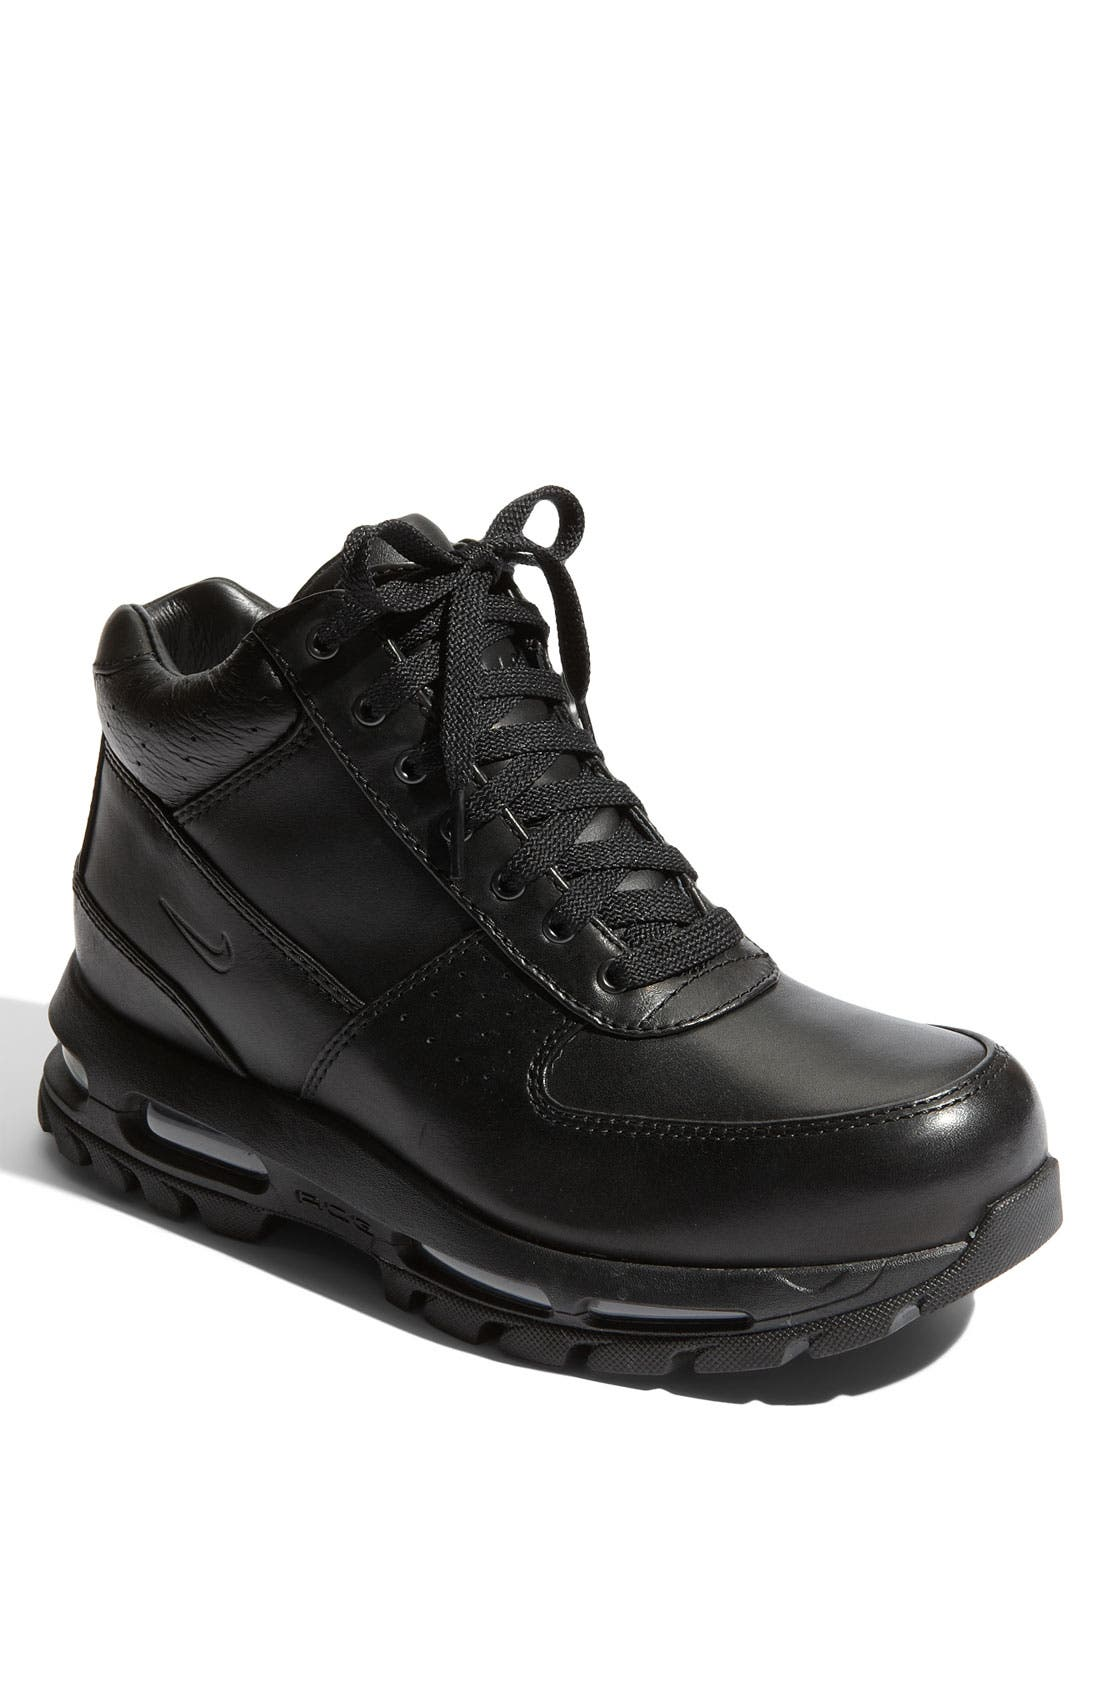 Alternate Image 1 Selected - Nike 'ACG Air Max Goadome' Boot